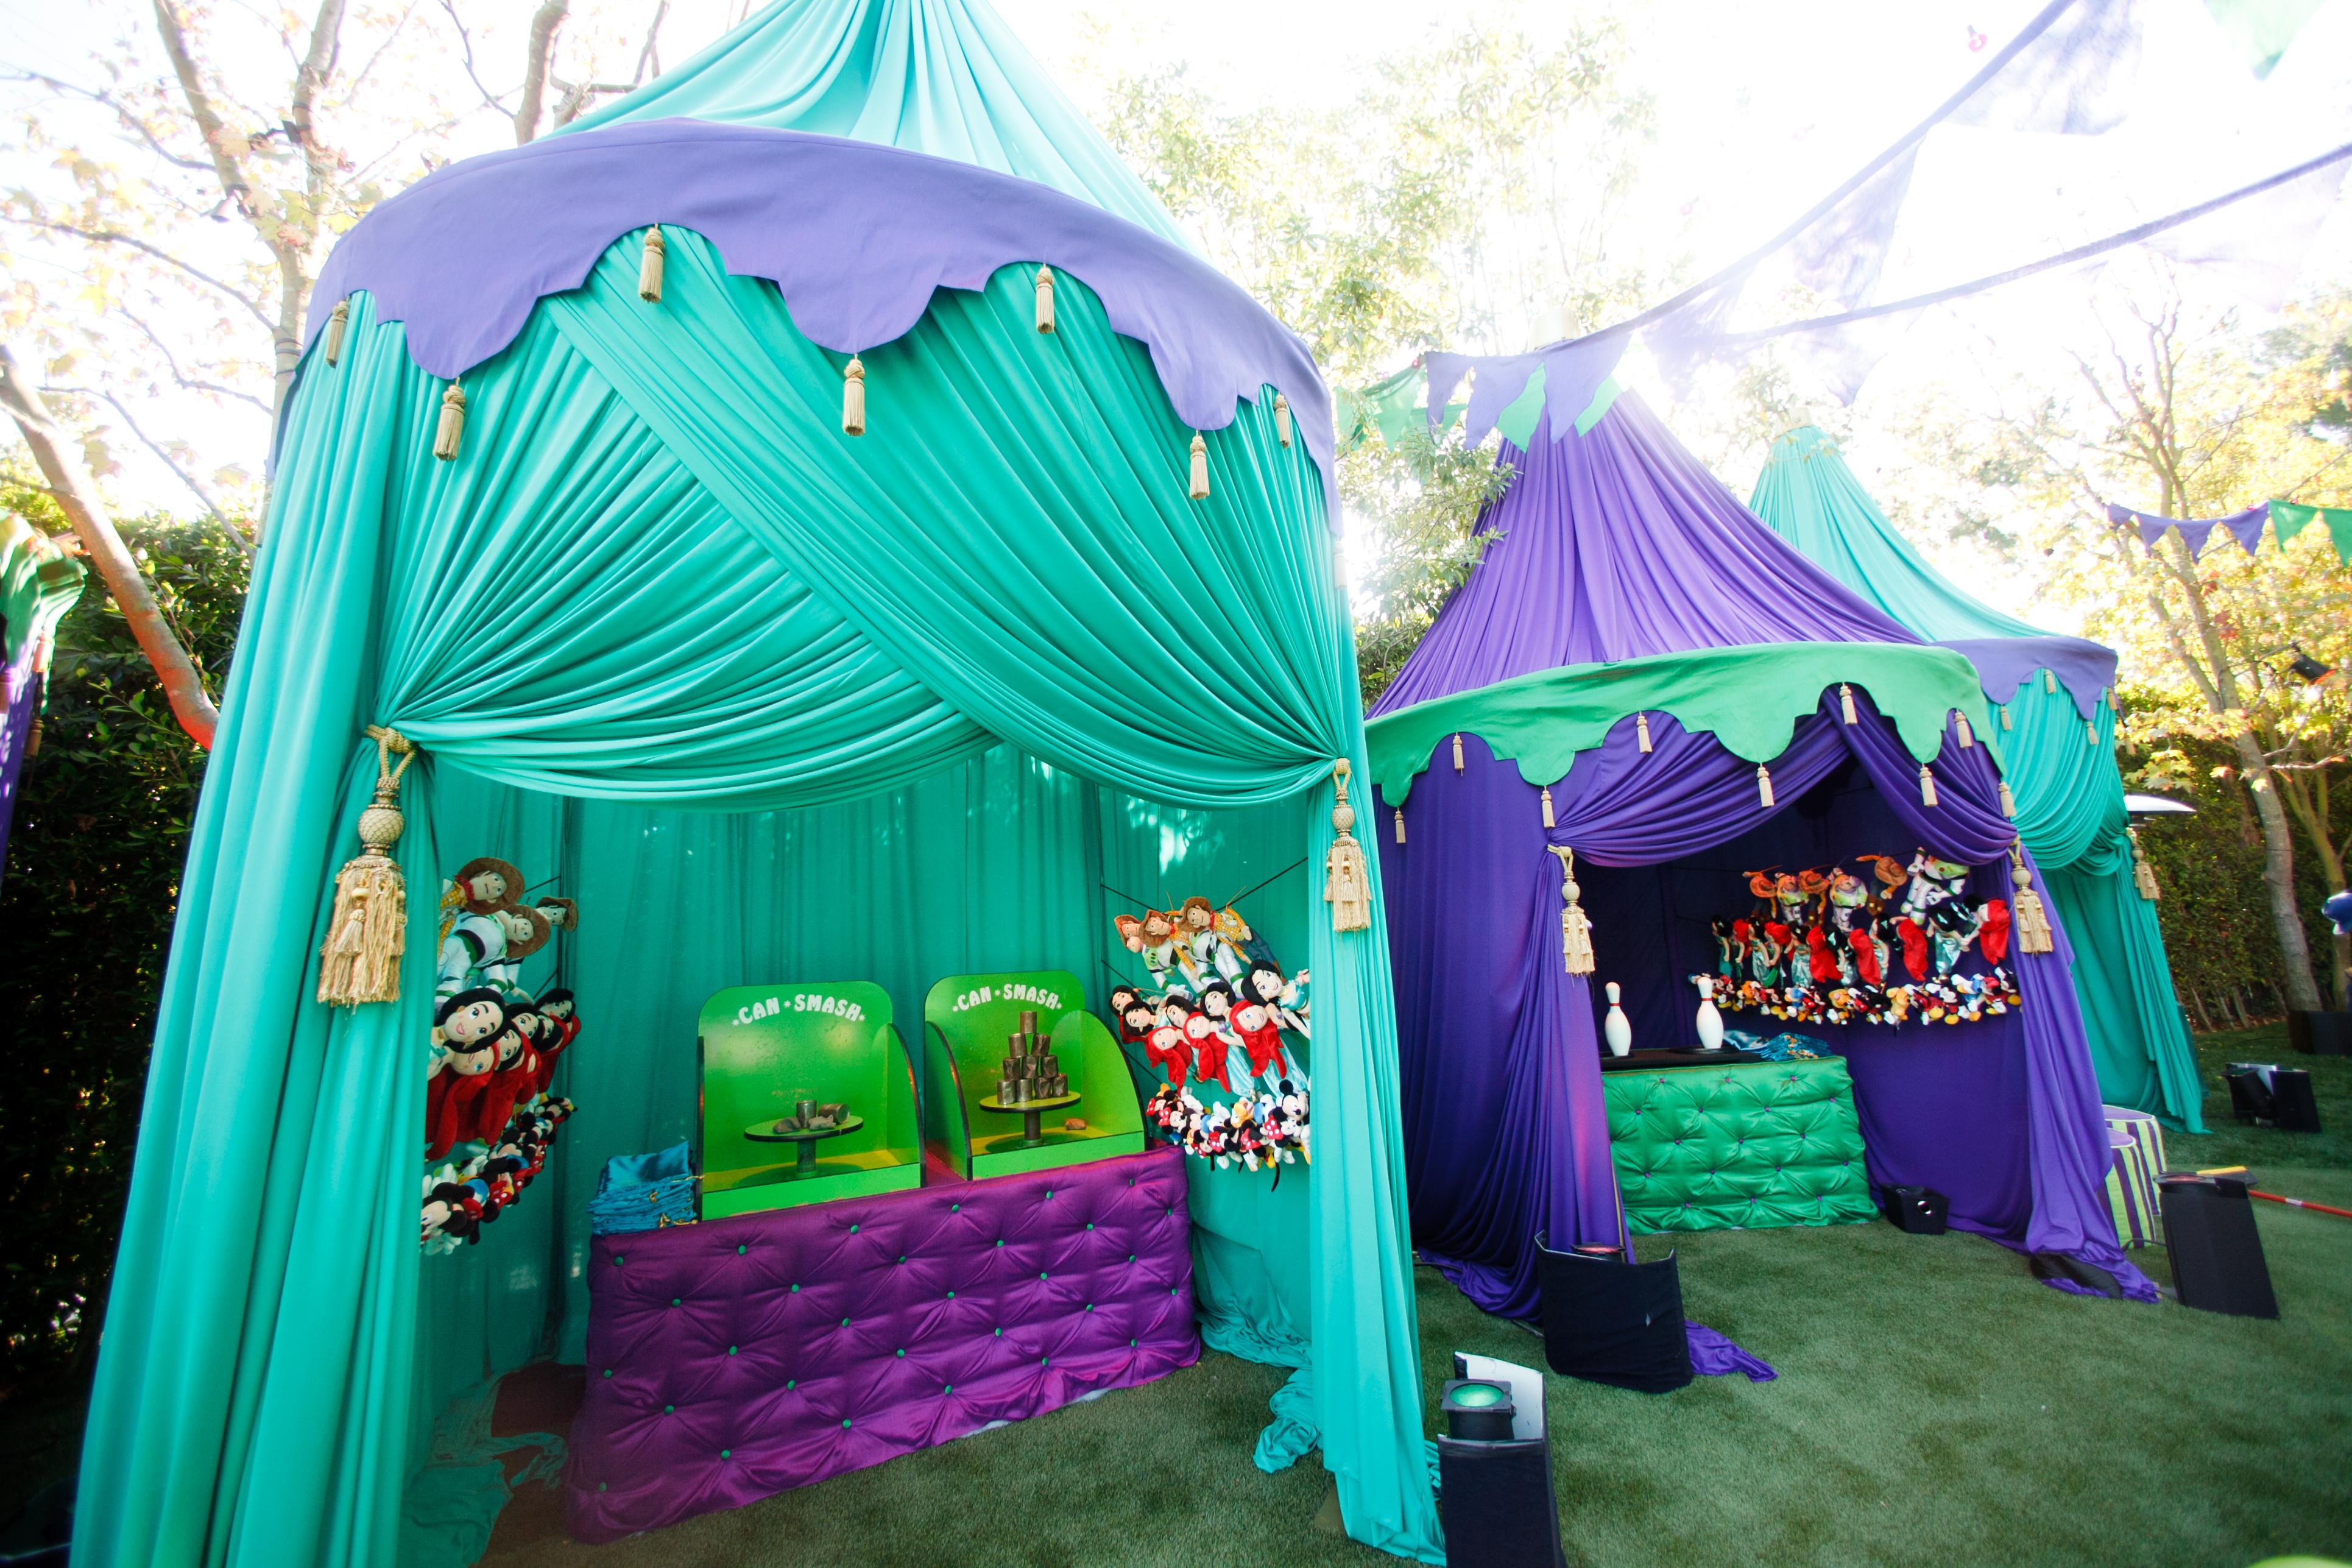 Shrek Playland Paradise Birthday Party - Sonia Sharma Events